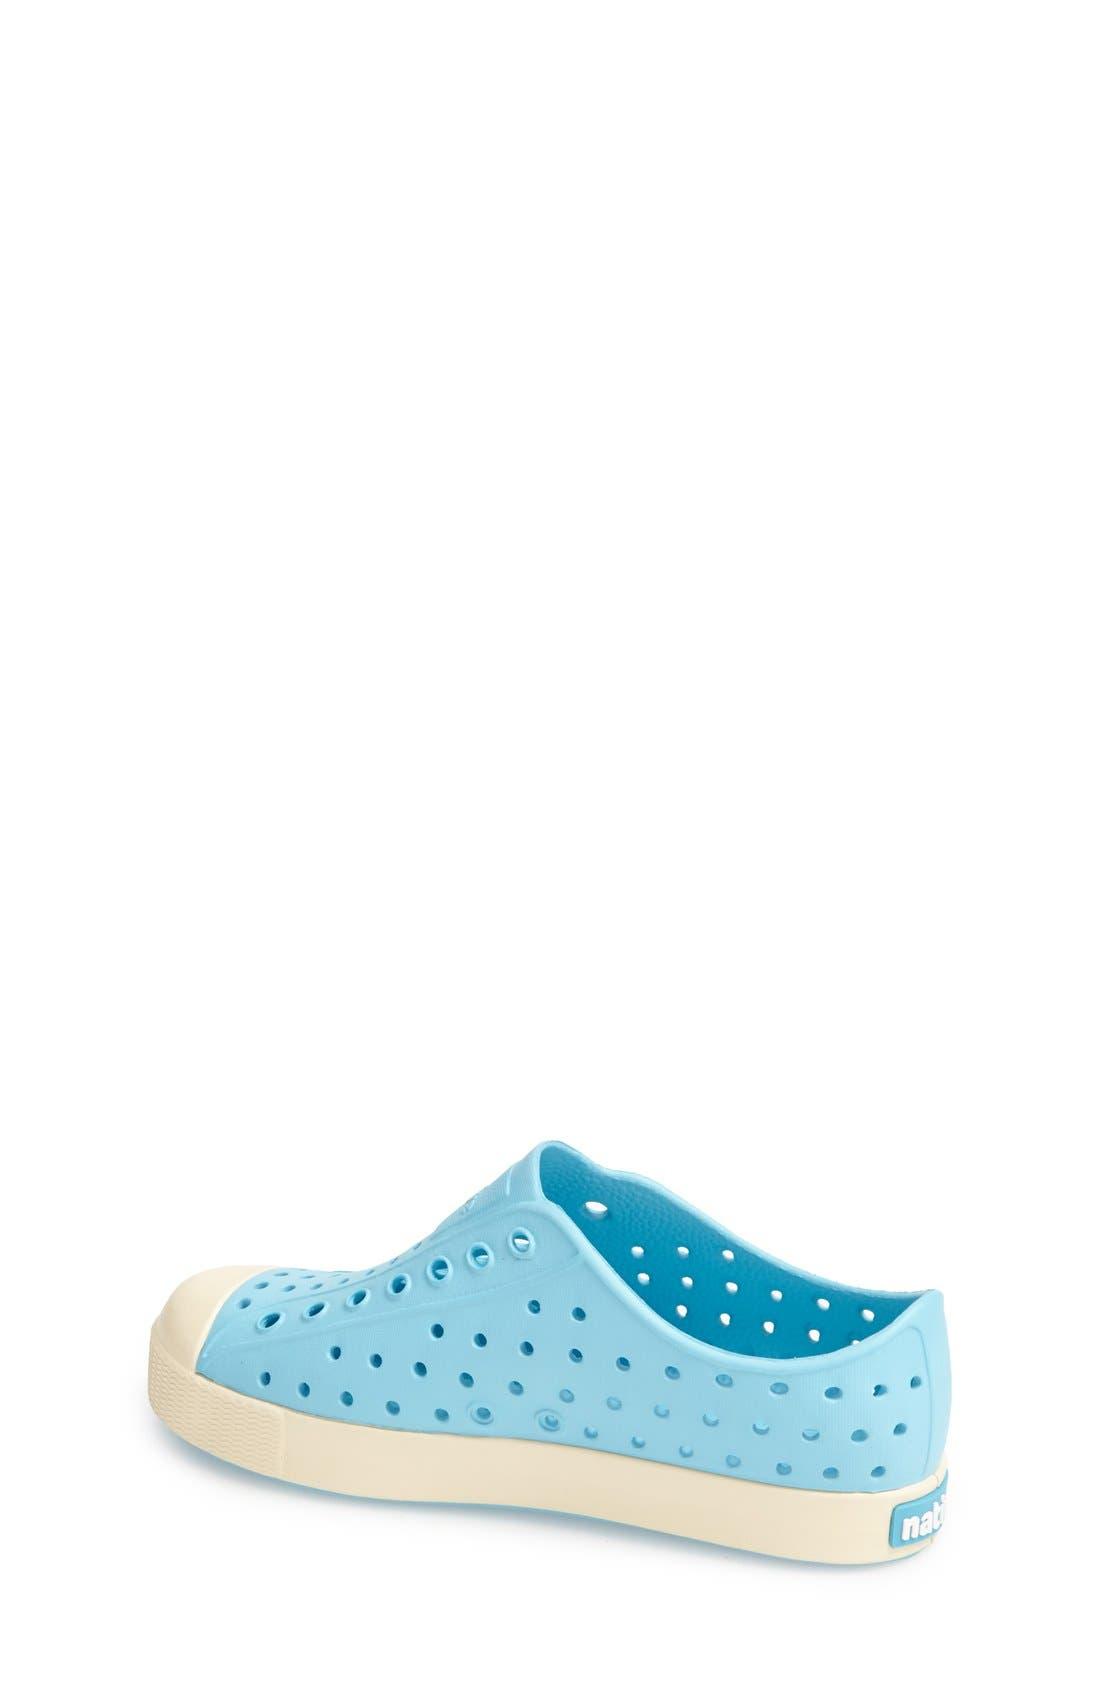 'Jefferson' Water Friendly Slip-On Sneaker,                             Alternate thumbnail 153, color,